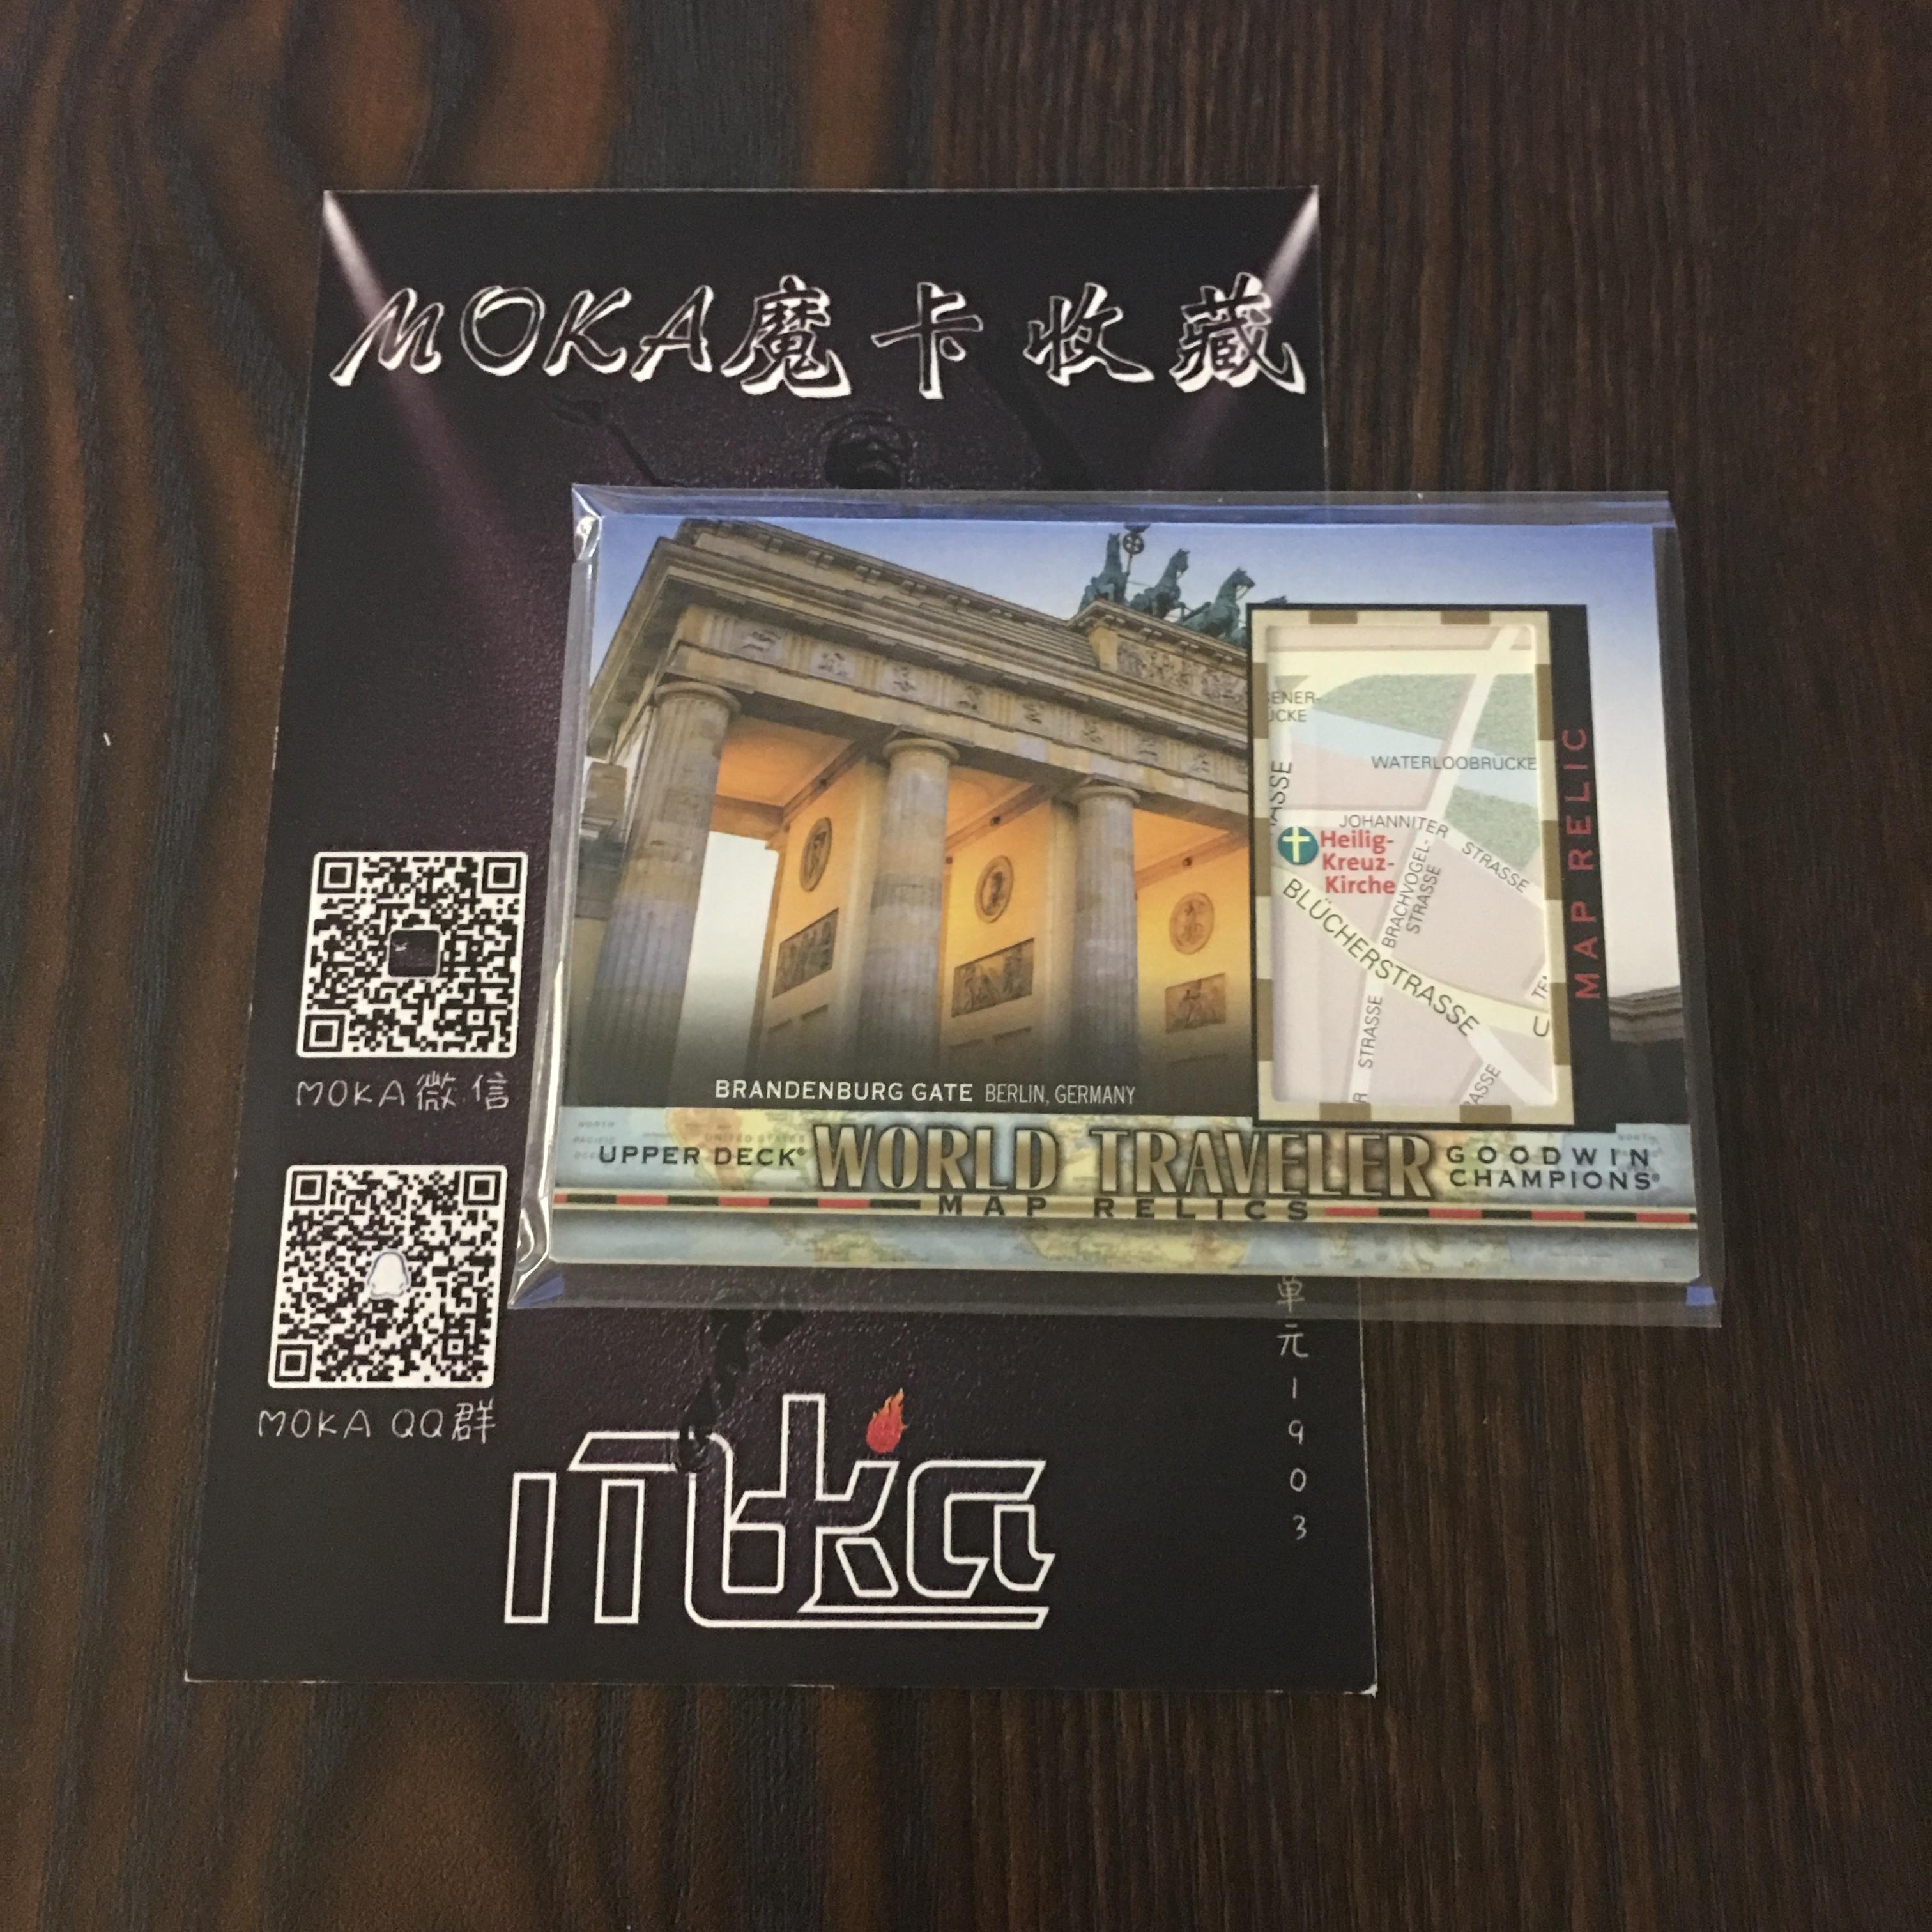 【MOKA球星卡收藏】#1804449 2018 UD Goodwin 古德温 地图卡 编号WT-60 凑套必备